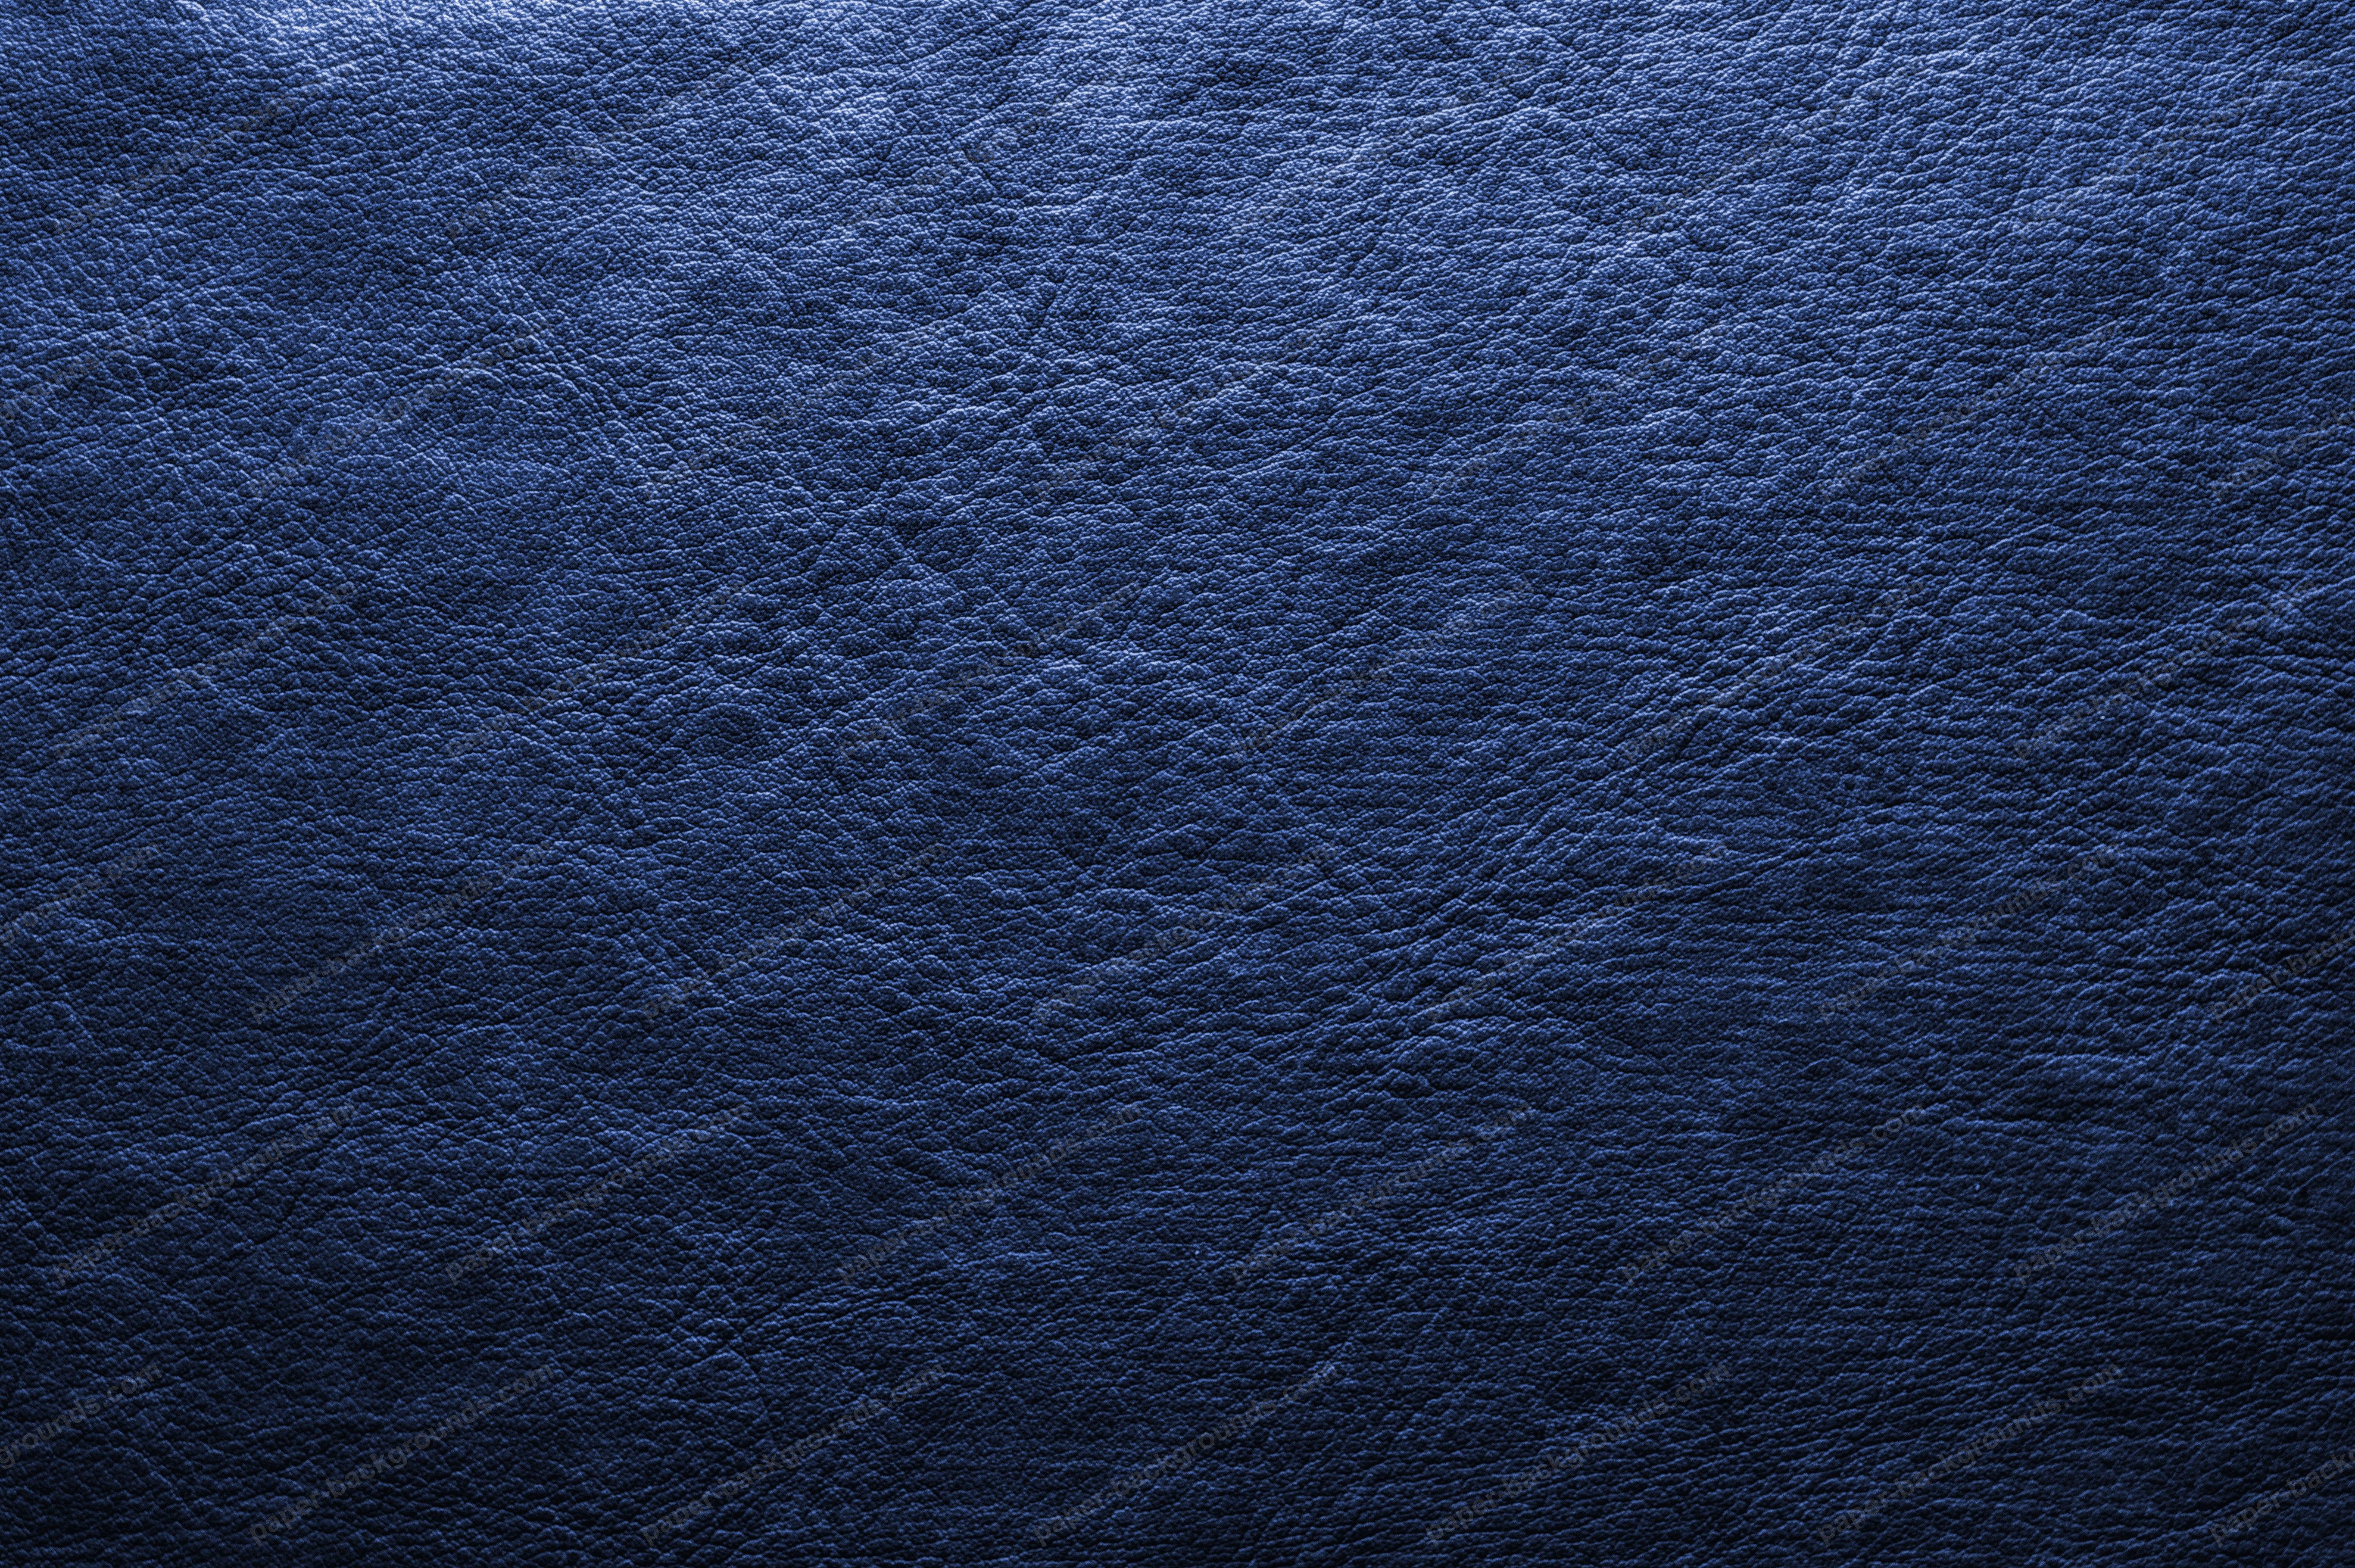 light blue leather background - photo #49